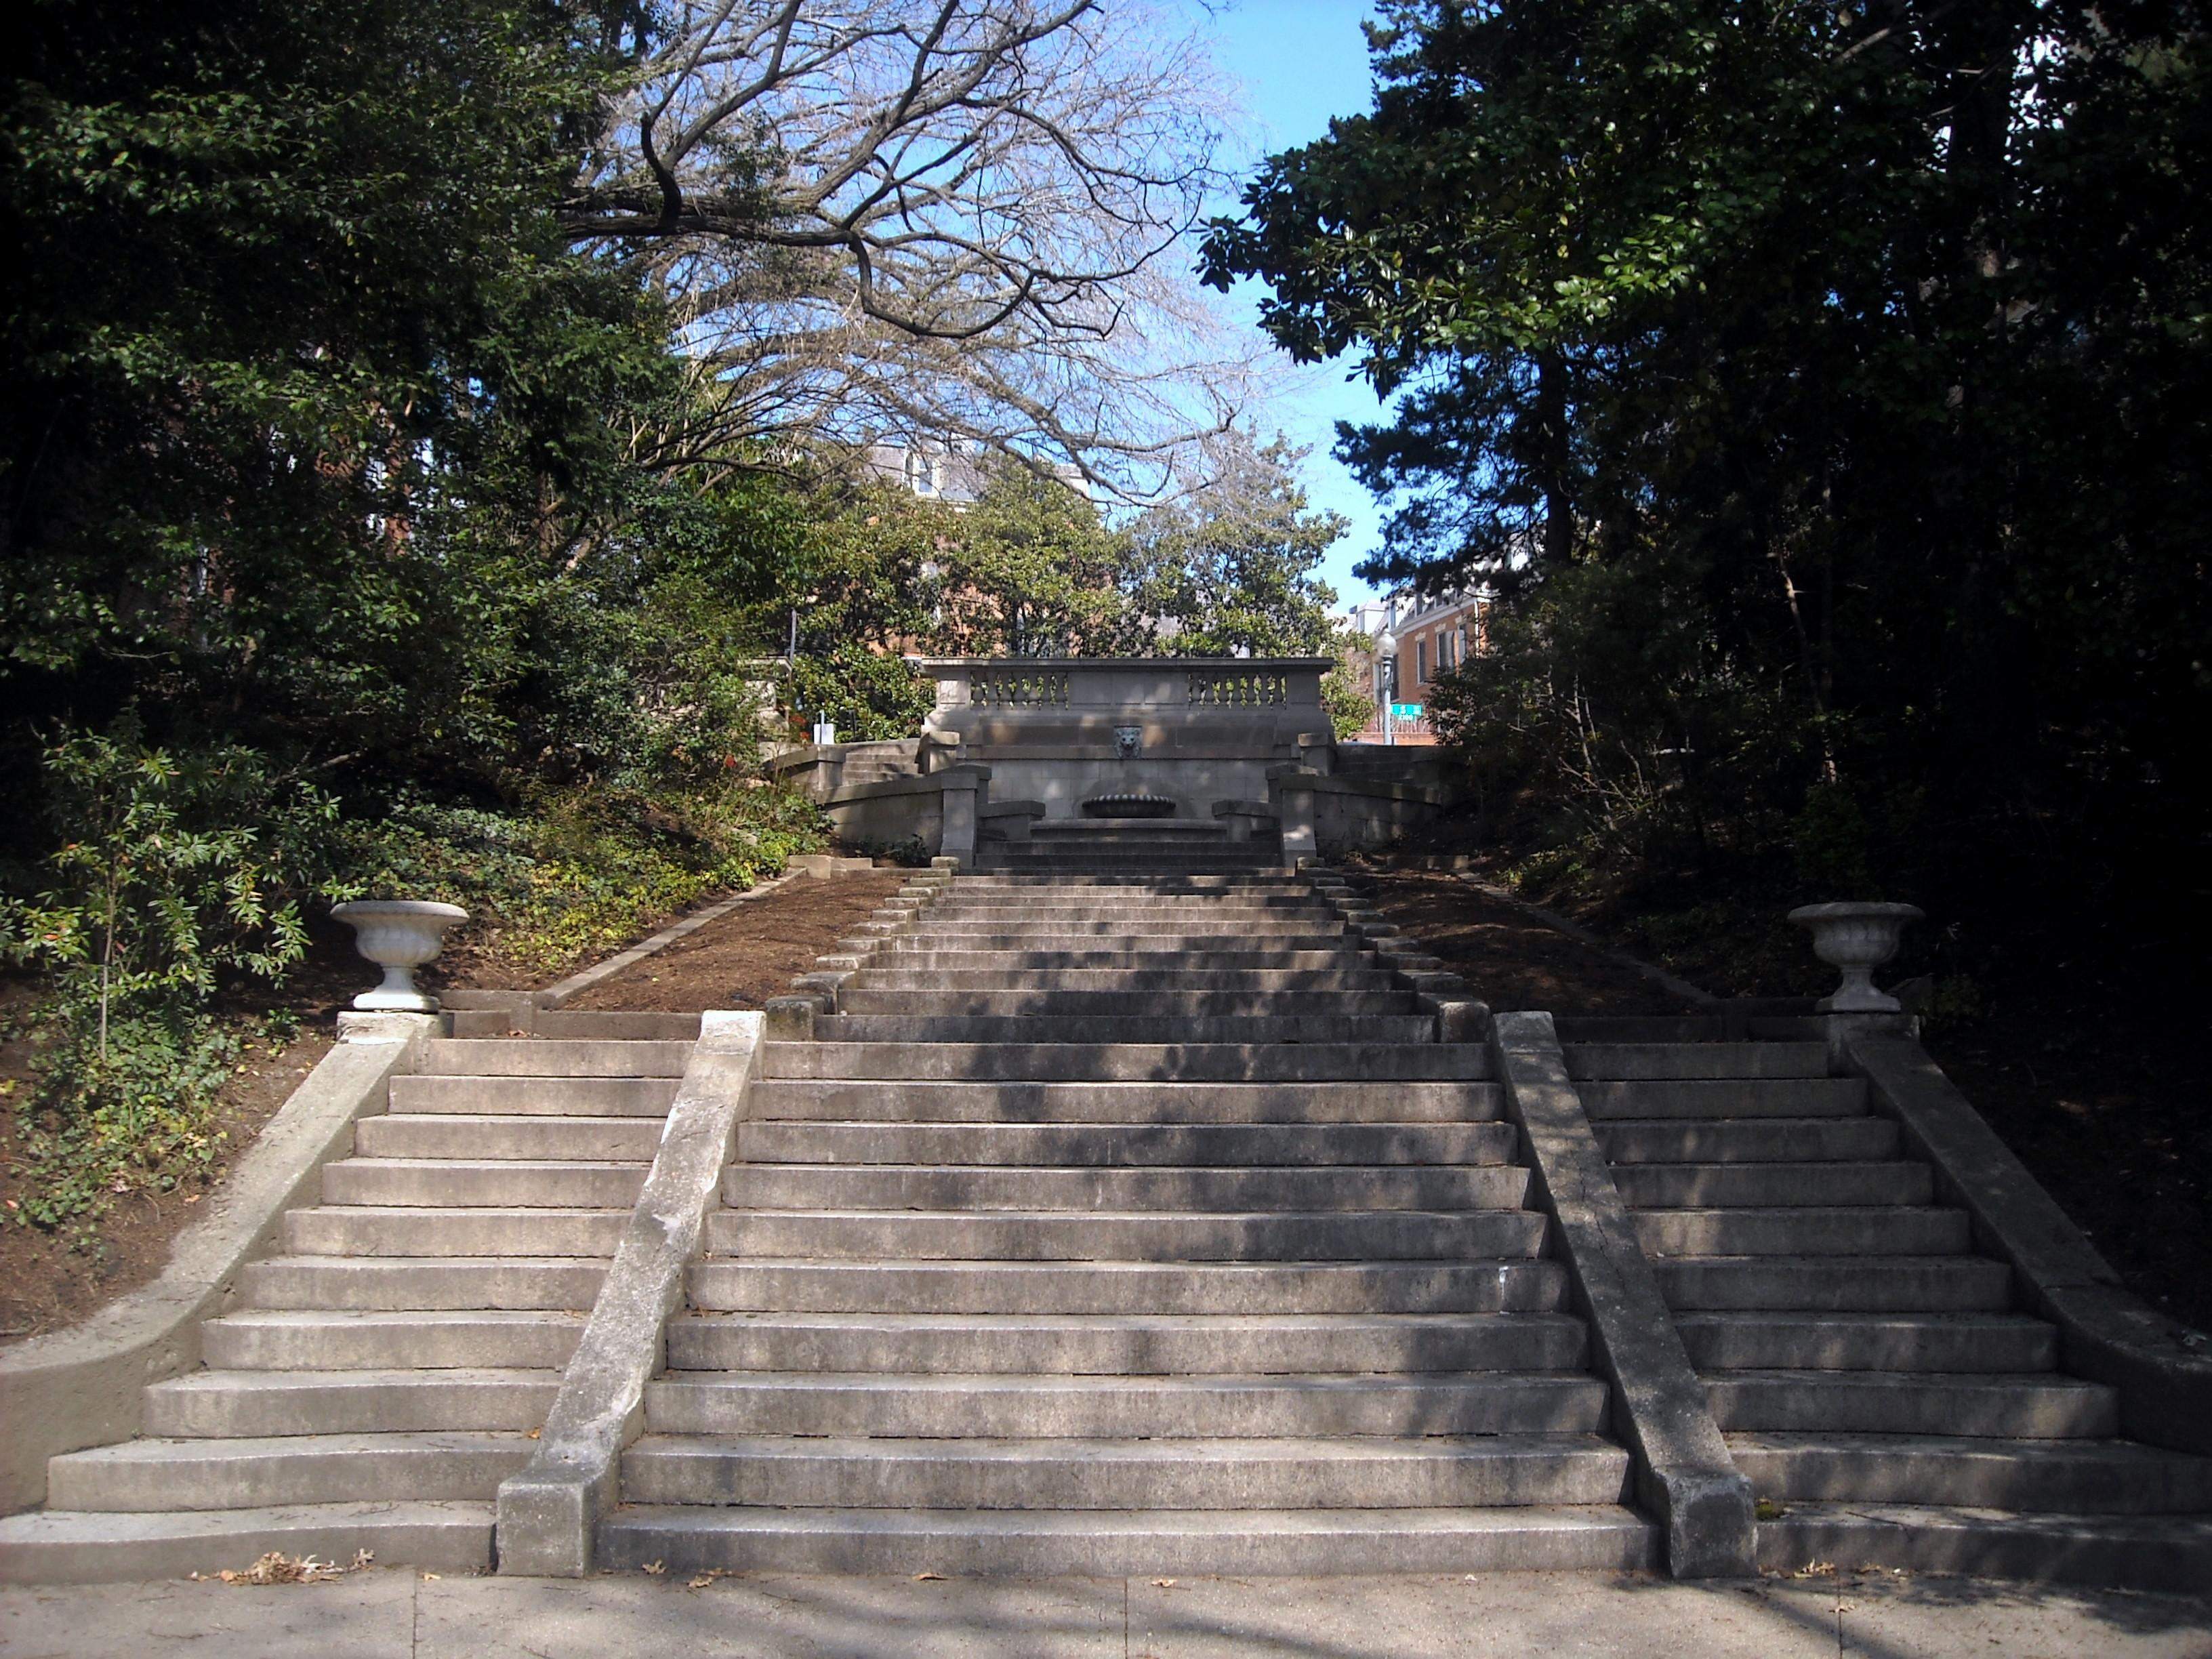 Image result for spanish steps washington dc